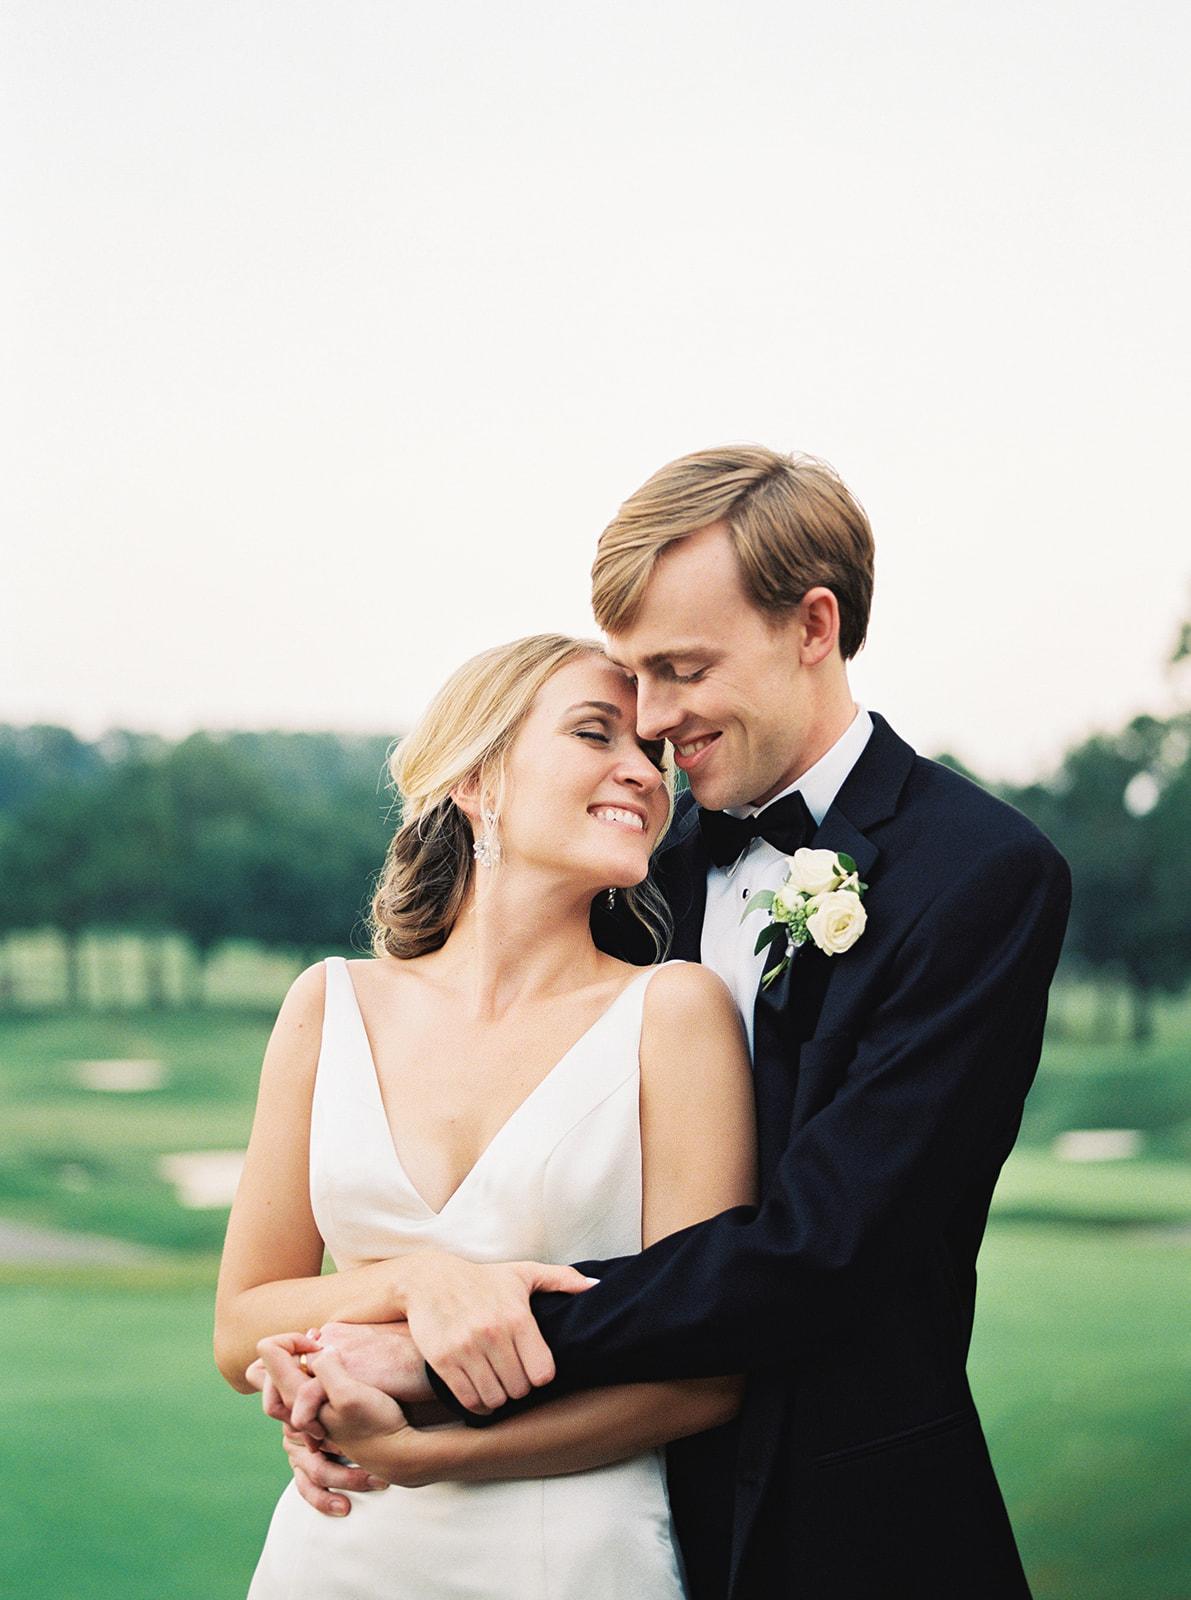 Bride and groom | Birmingham, Alabama wedding | Taylor Dane Photography | Custom wedding invitations by Little Fox Paperie | Gracie Nunez